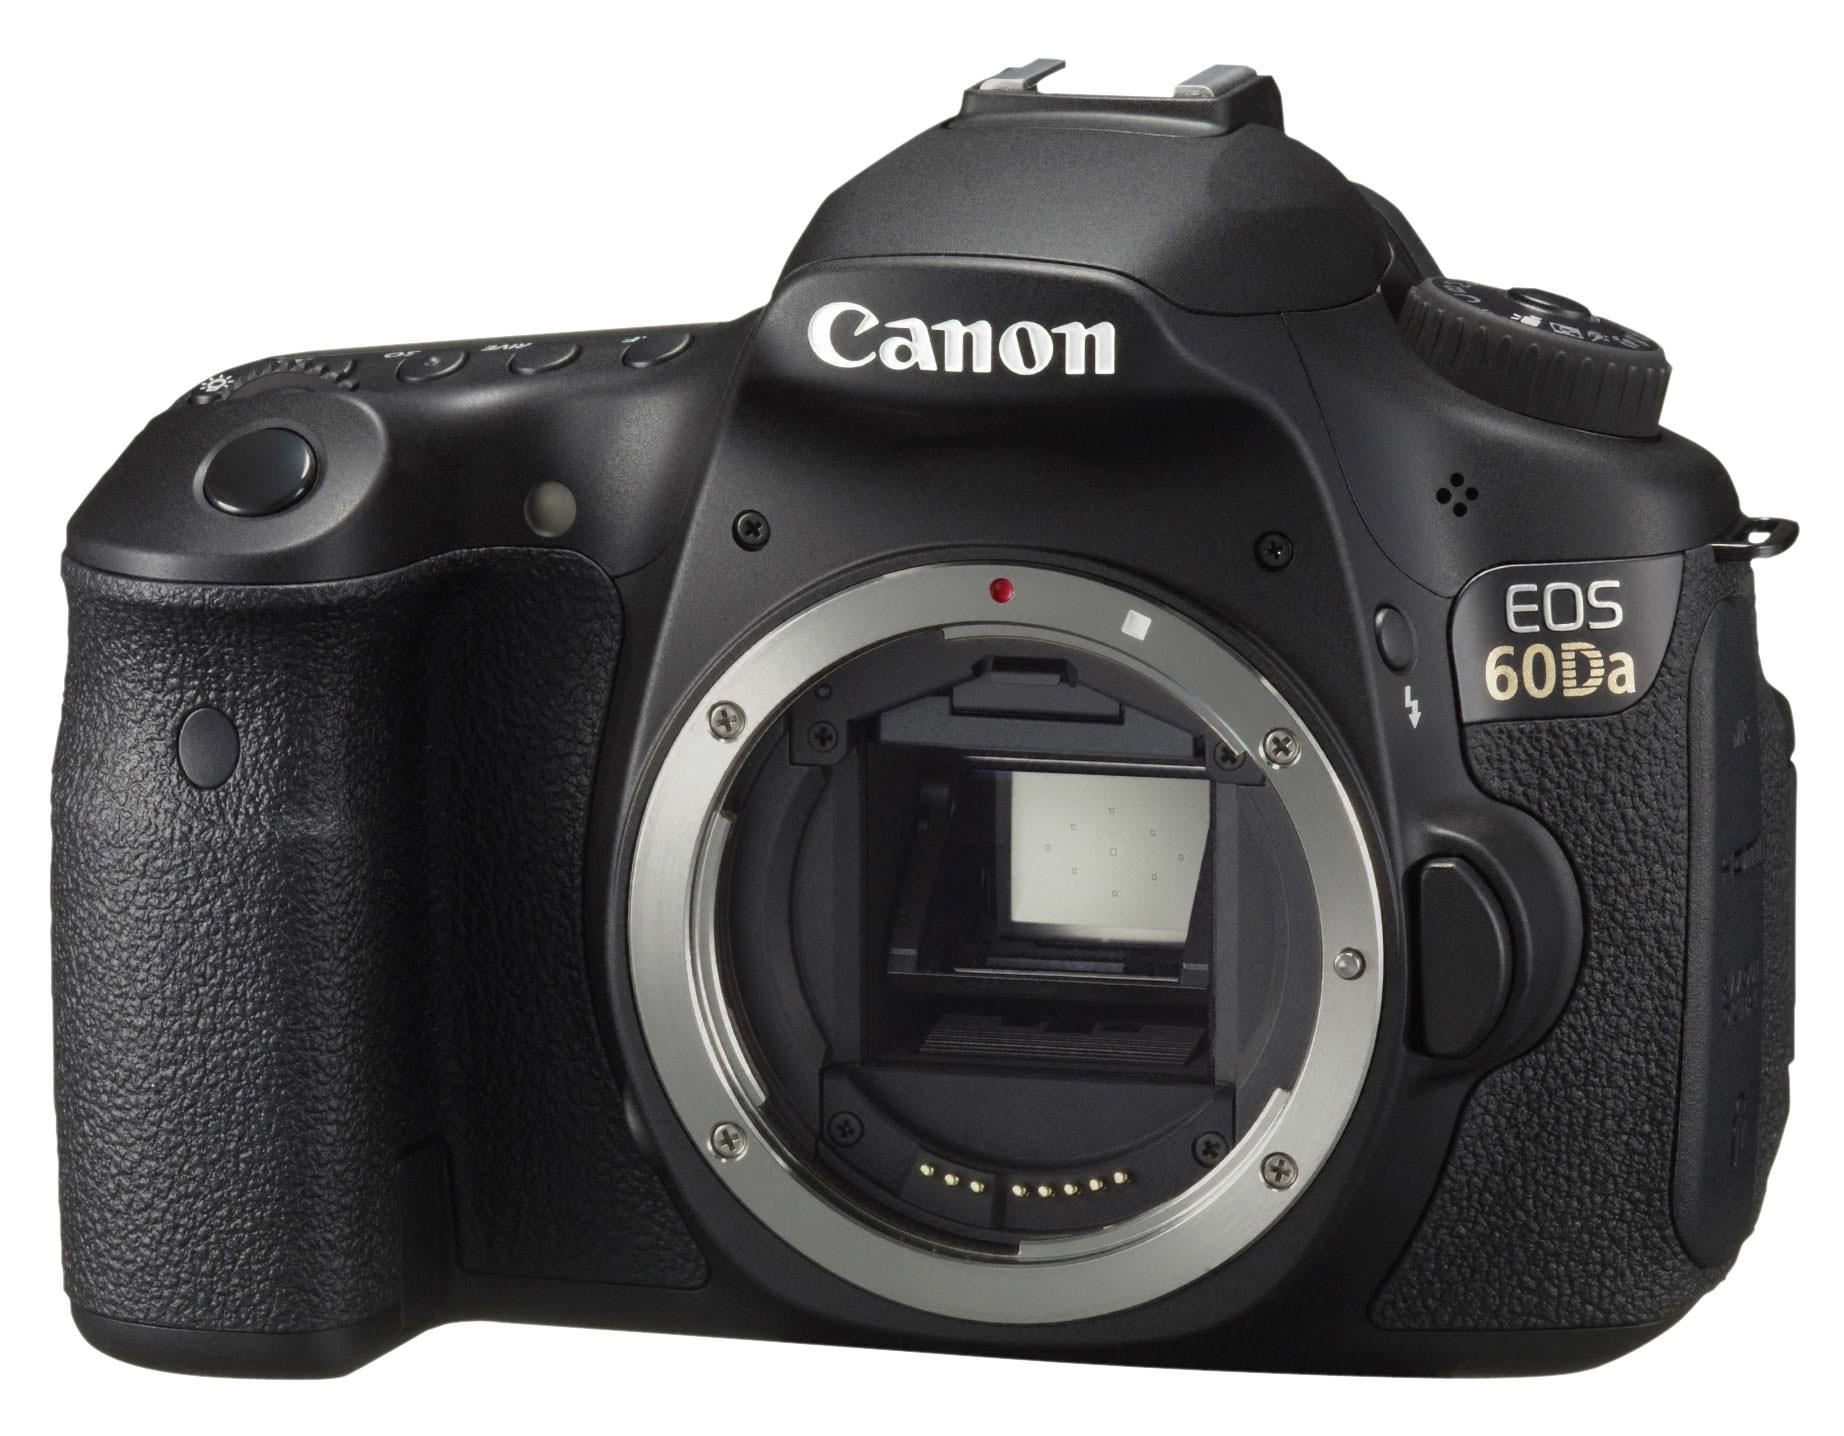 Camera Canon 20da Dslr Camera canon eos 60da astrophotography dslr fsl